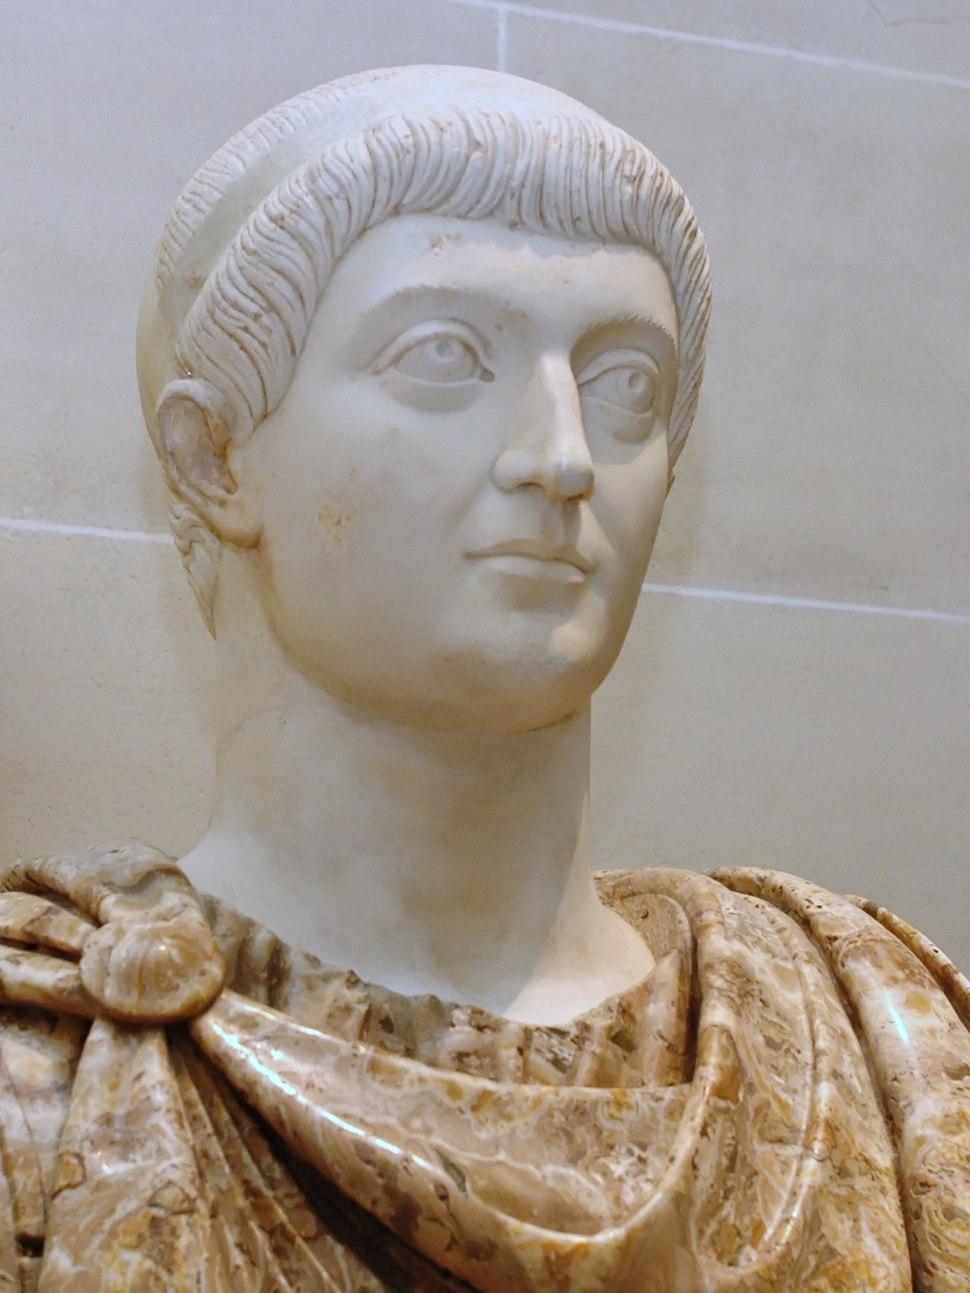 Emperor Constans Louvre Ma1021